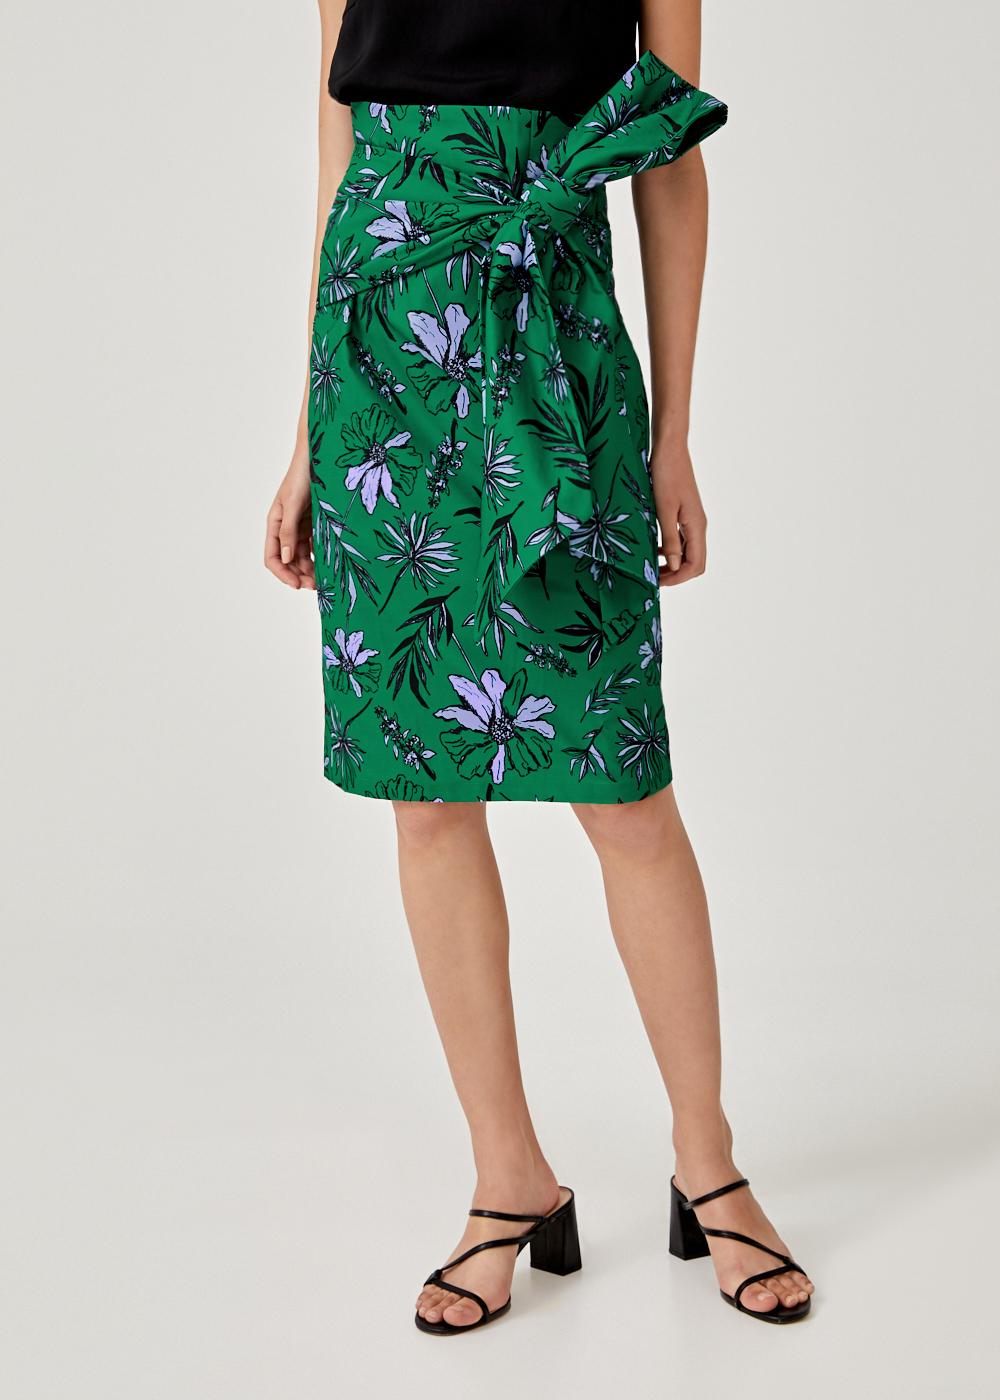 Sydena Tie Front Pencil Skirt in Botanica Bloom